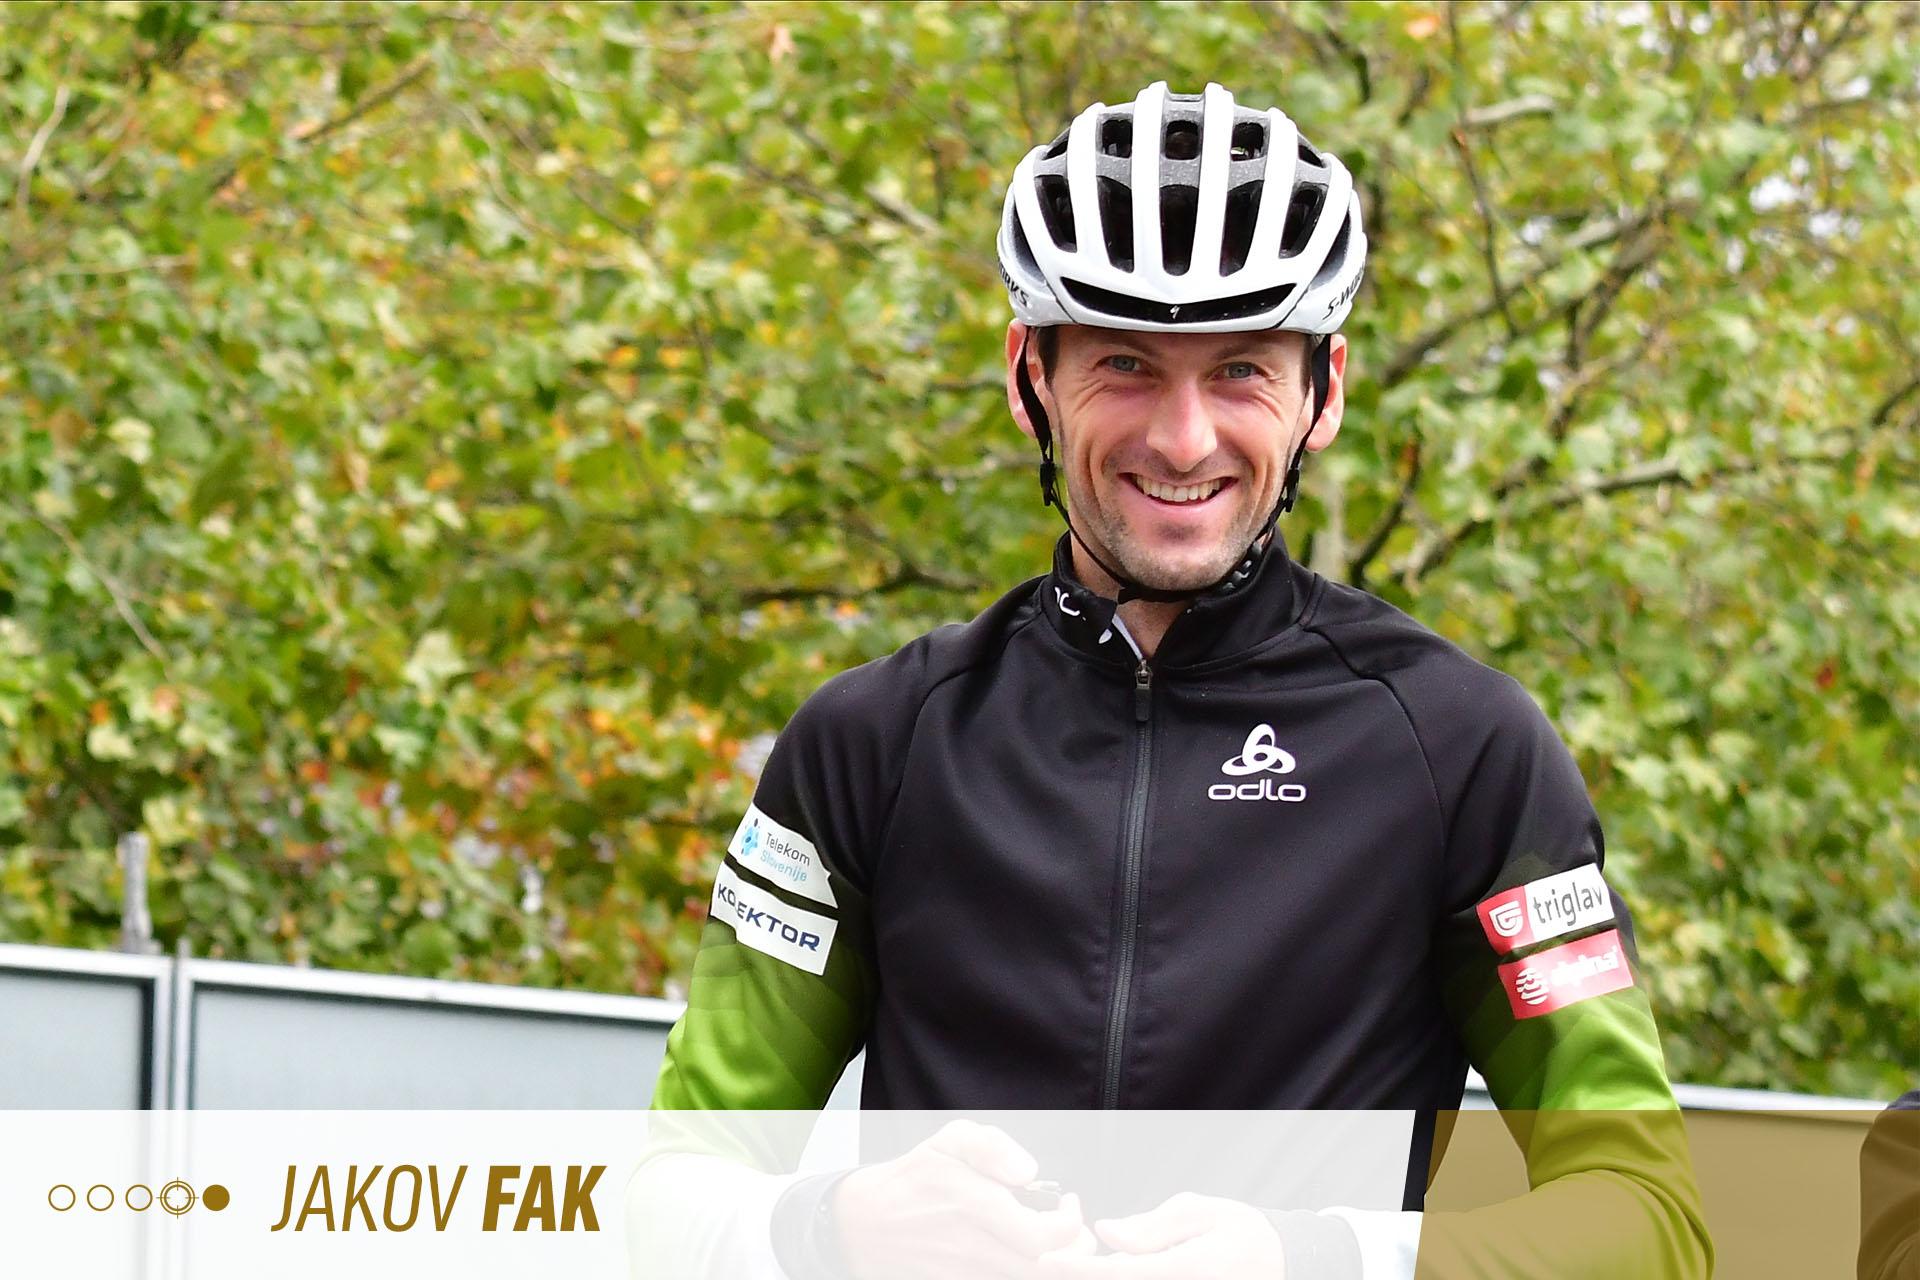 Athleten_JakovFak